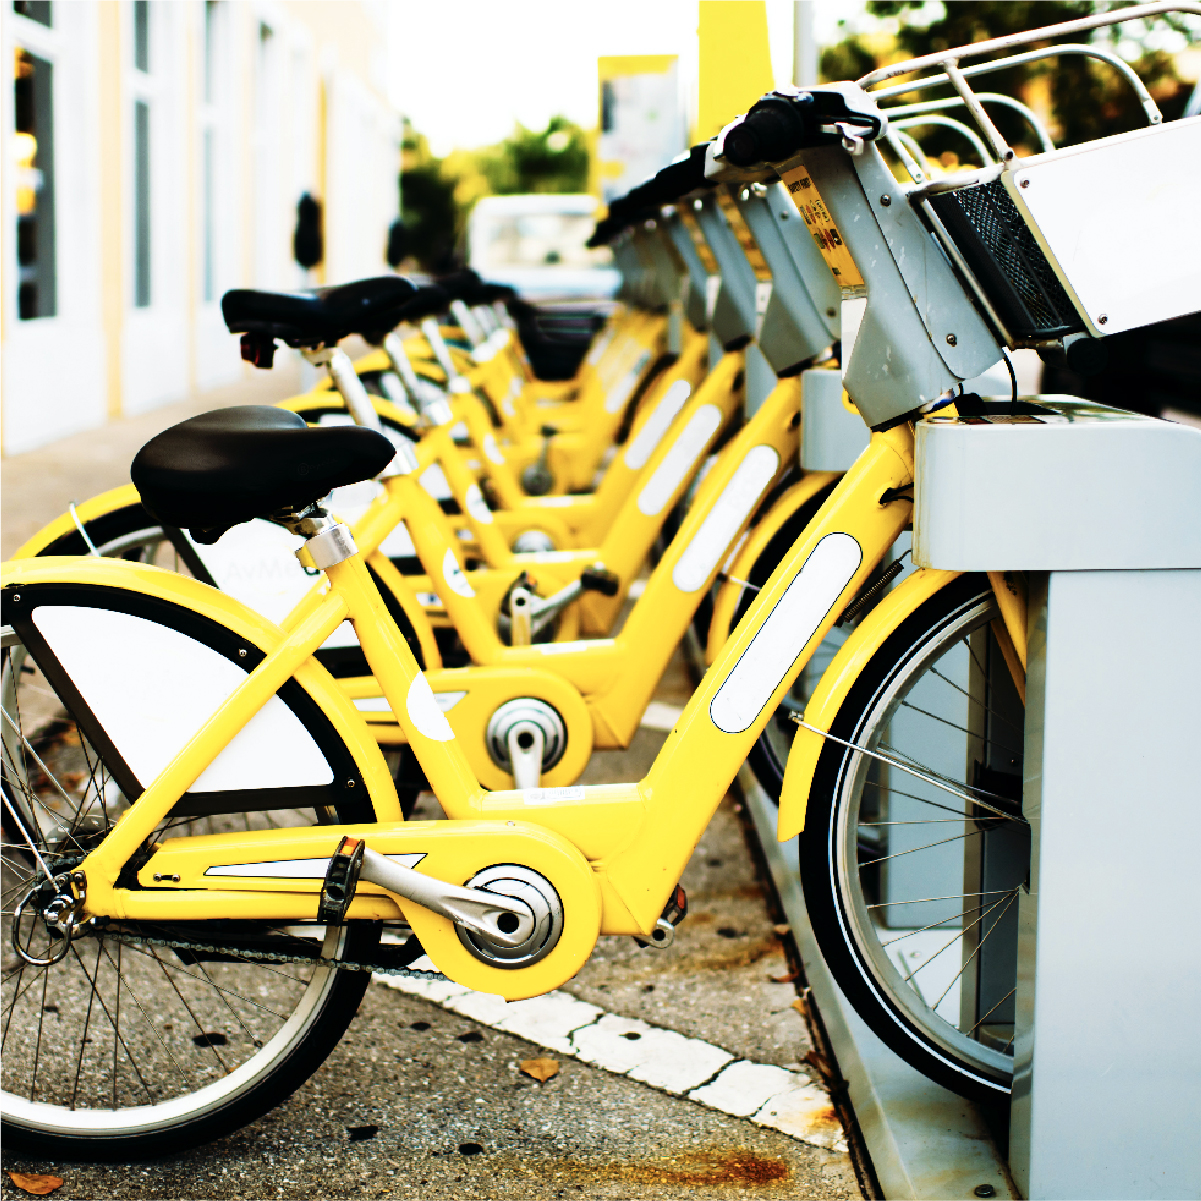 Yello bikes in rack